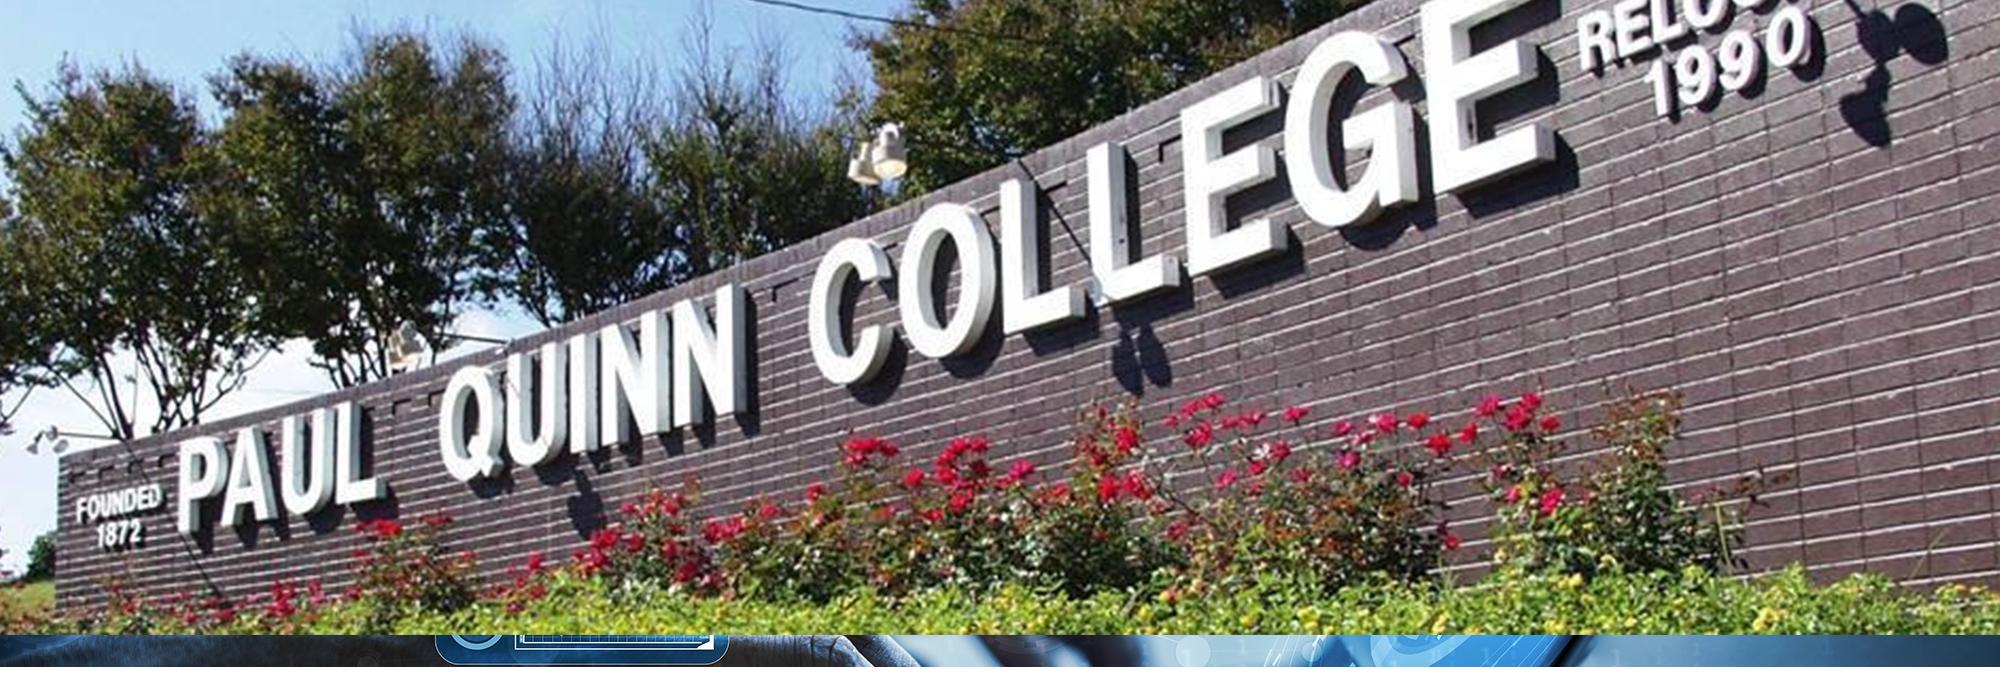 iDesign | News | Paul Quinn College Partnership